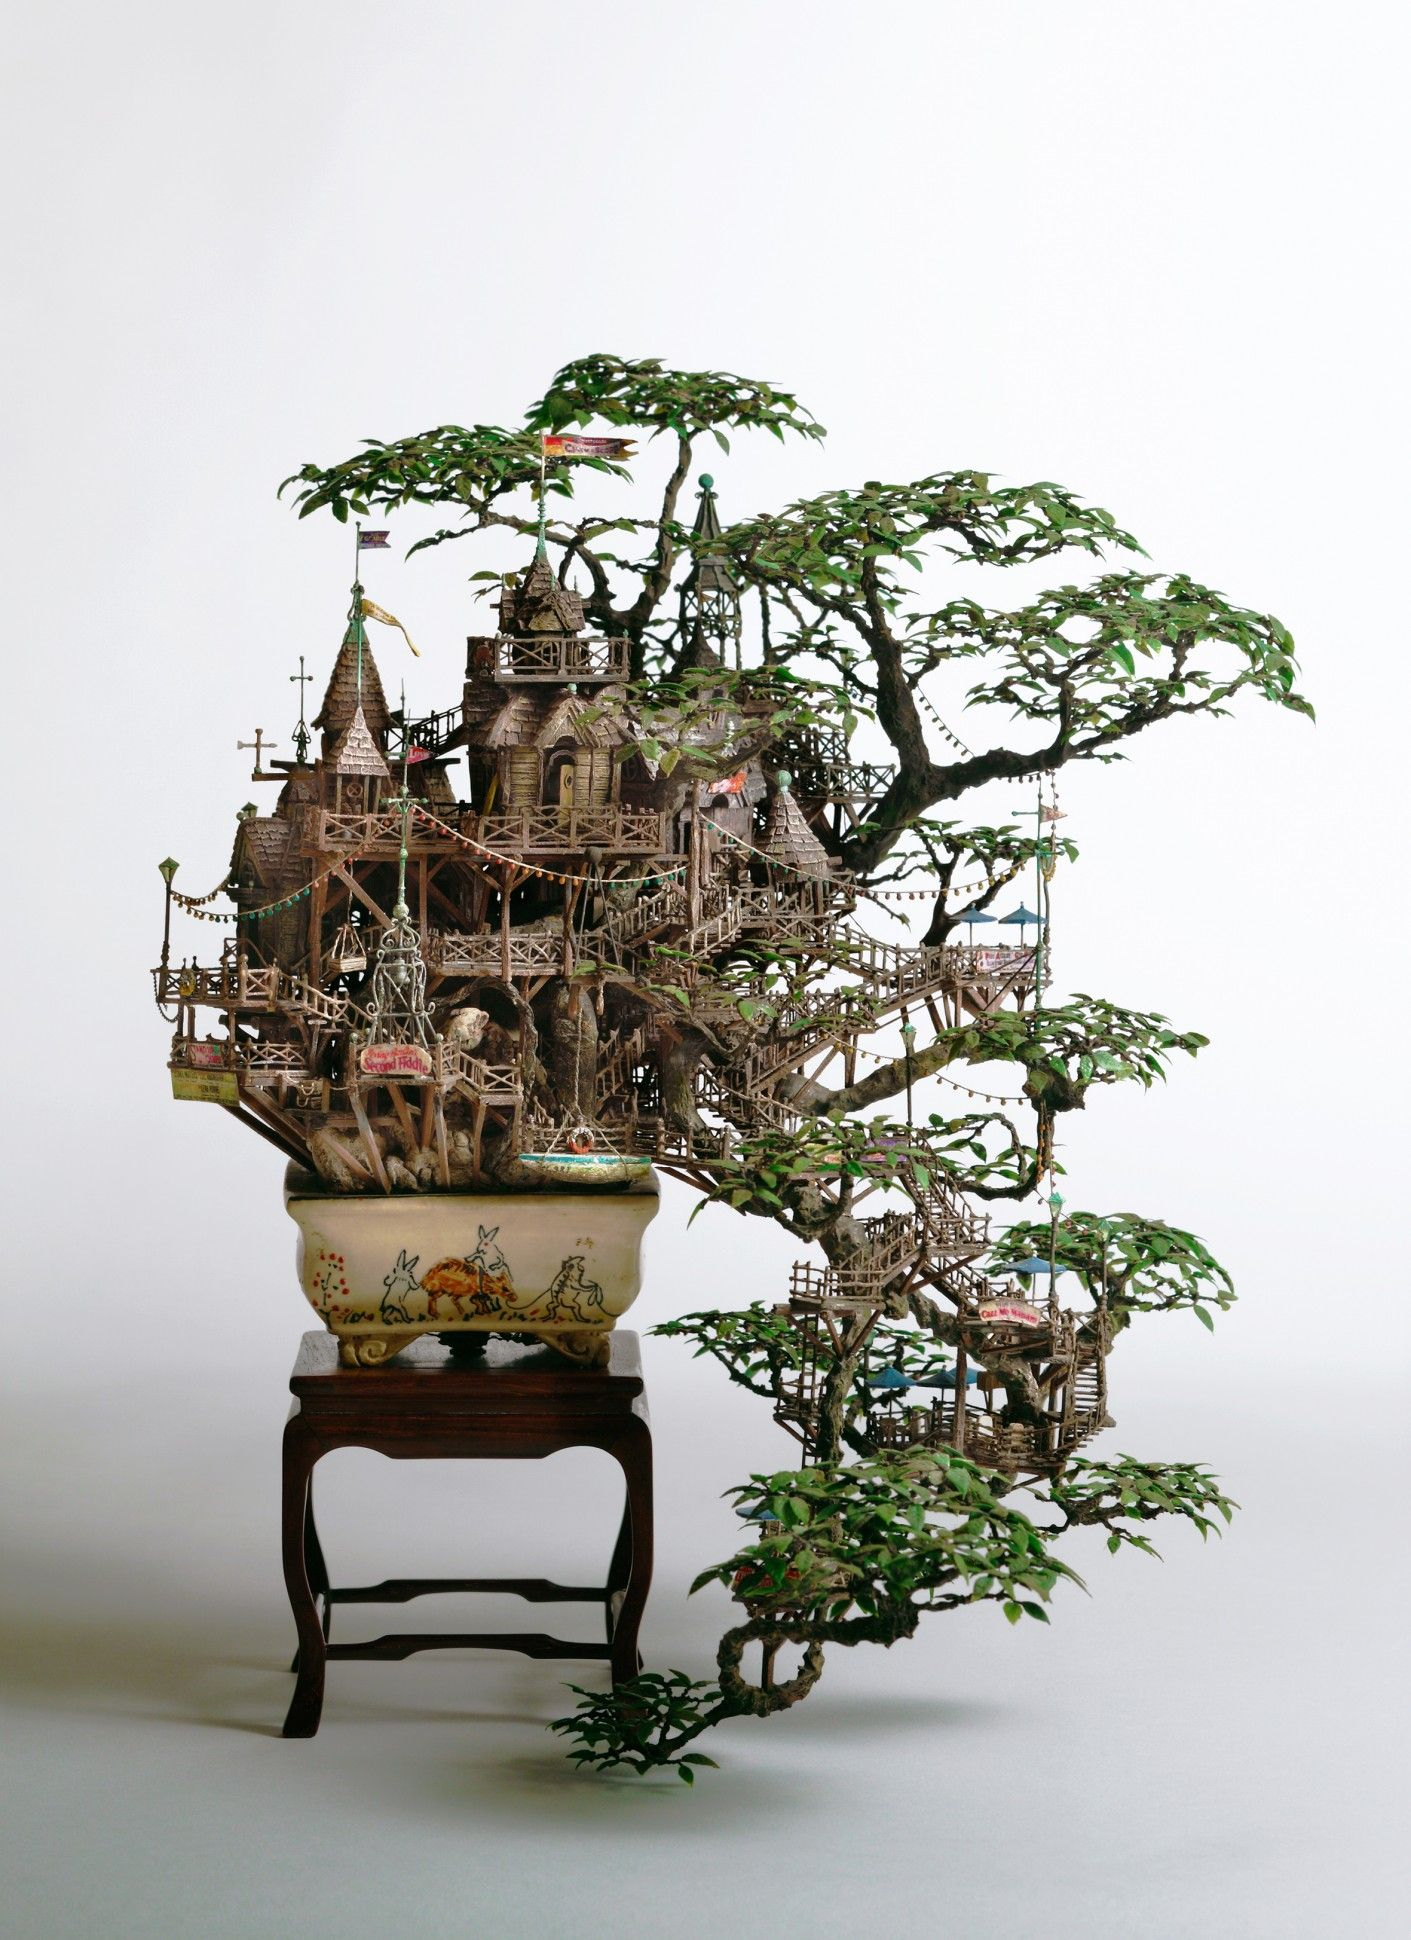 IIWTL Iu0027d Get This Bonsai Tree Castle